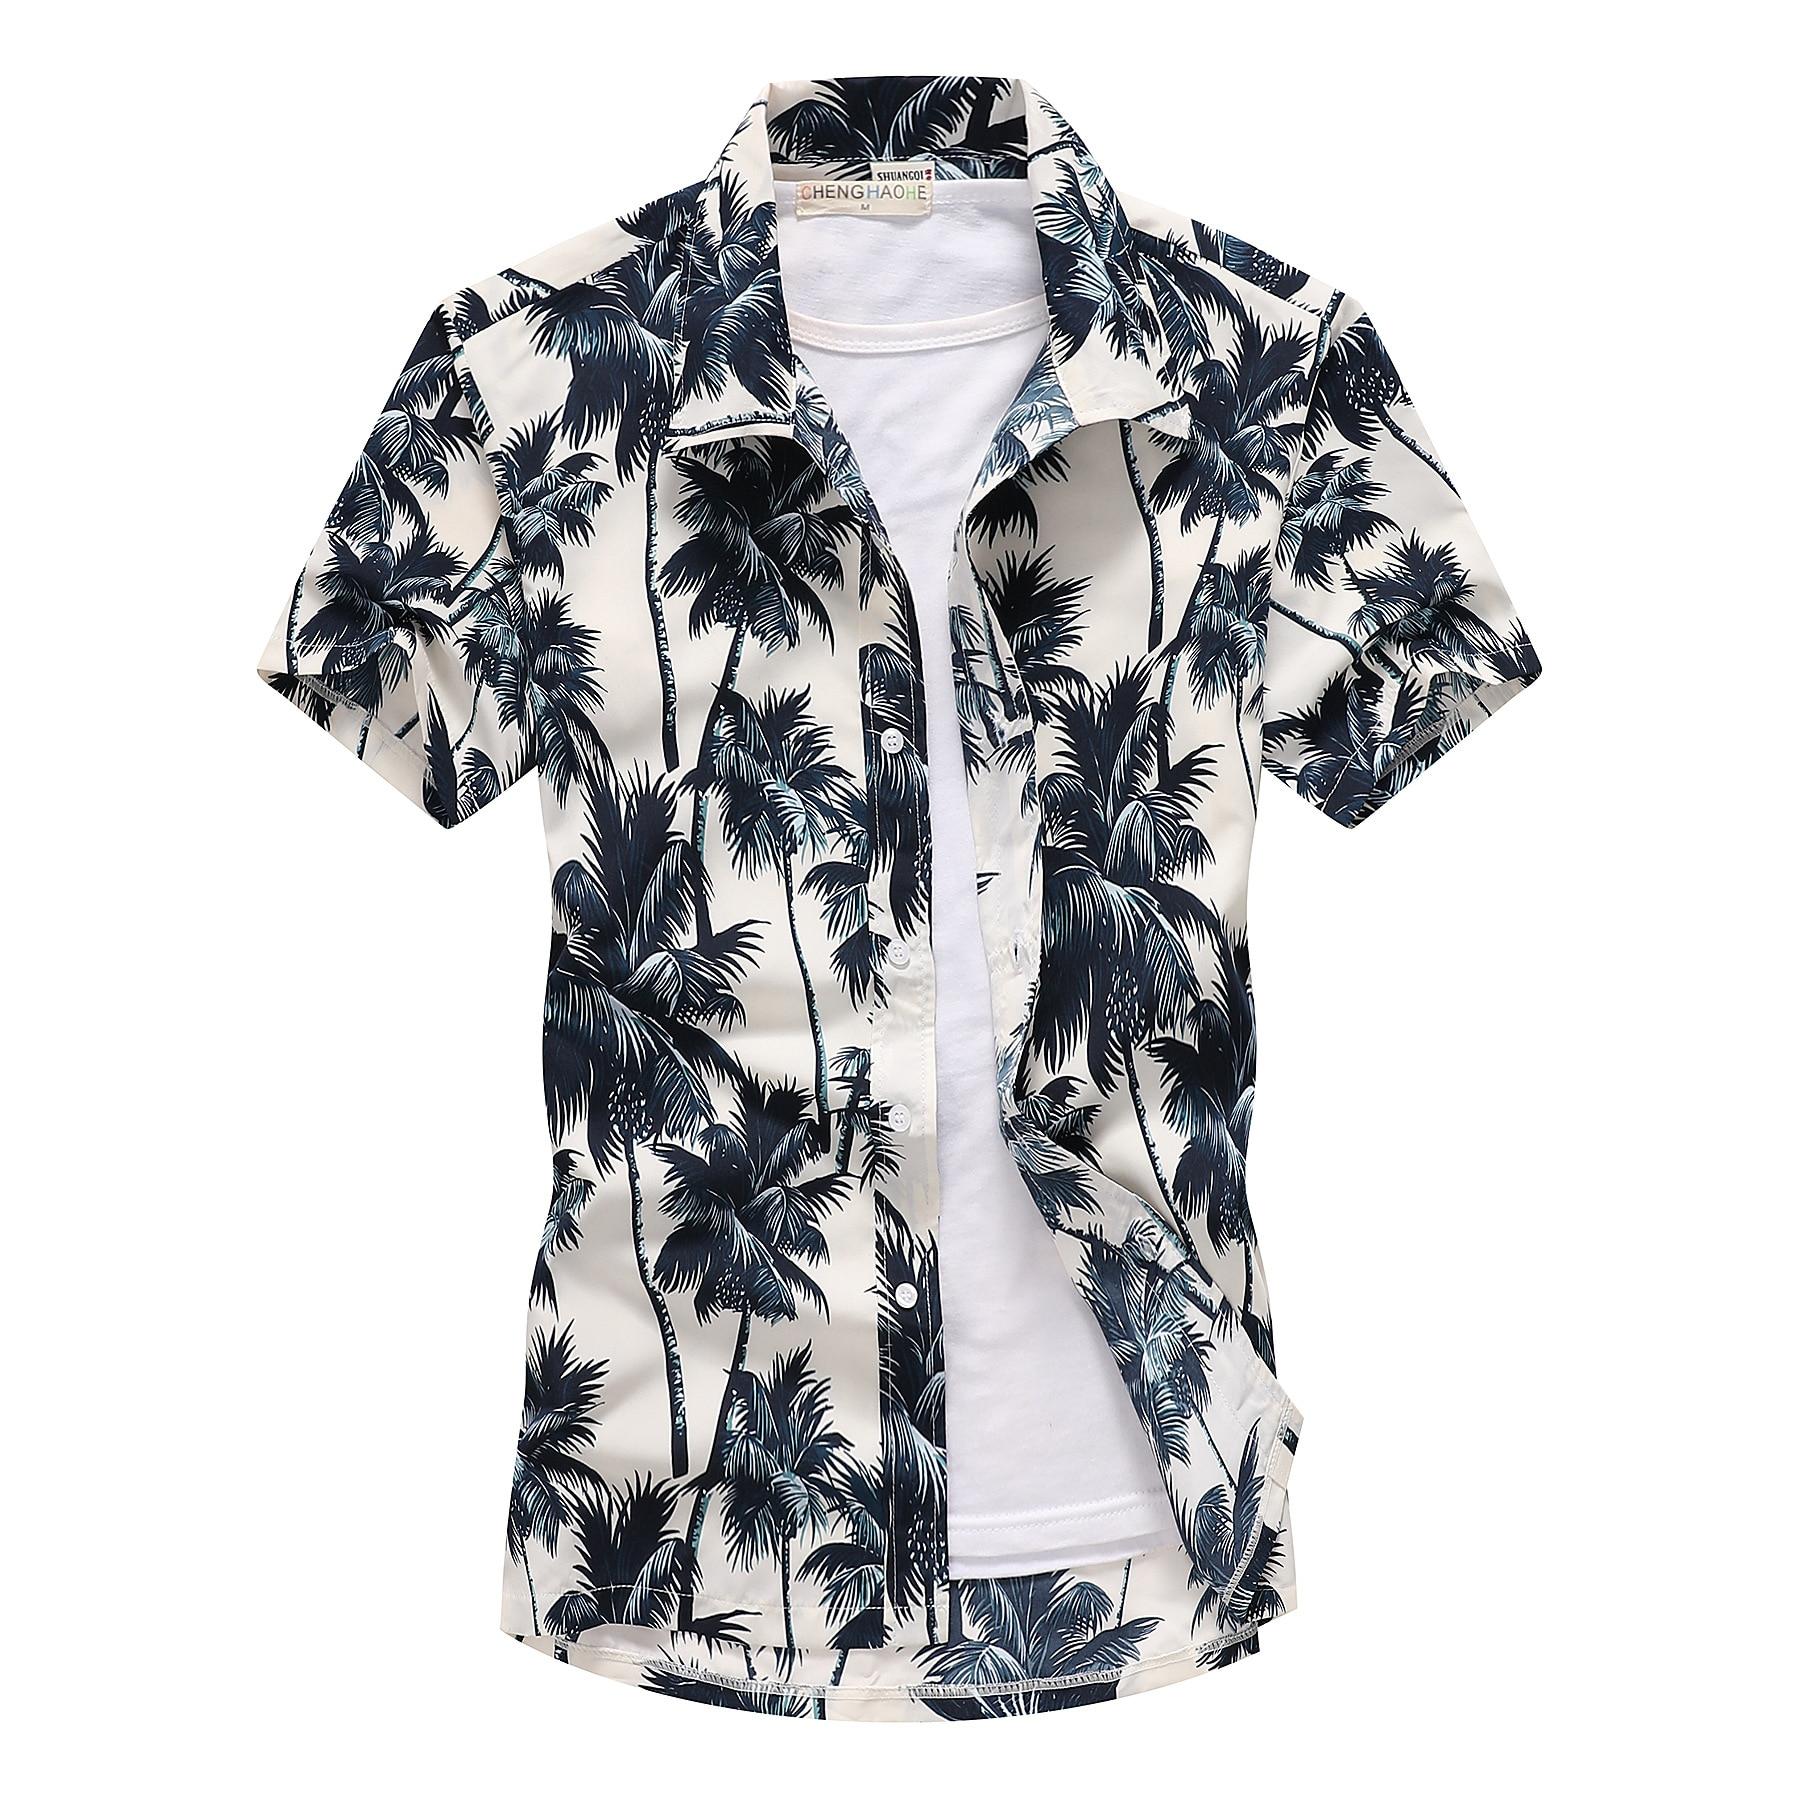 Beach Shirts Summer Fashion Camisa Masculina Coconut Tree Printed Short Sleeve Button Down Hawaiian Shirts Mens Plus Size